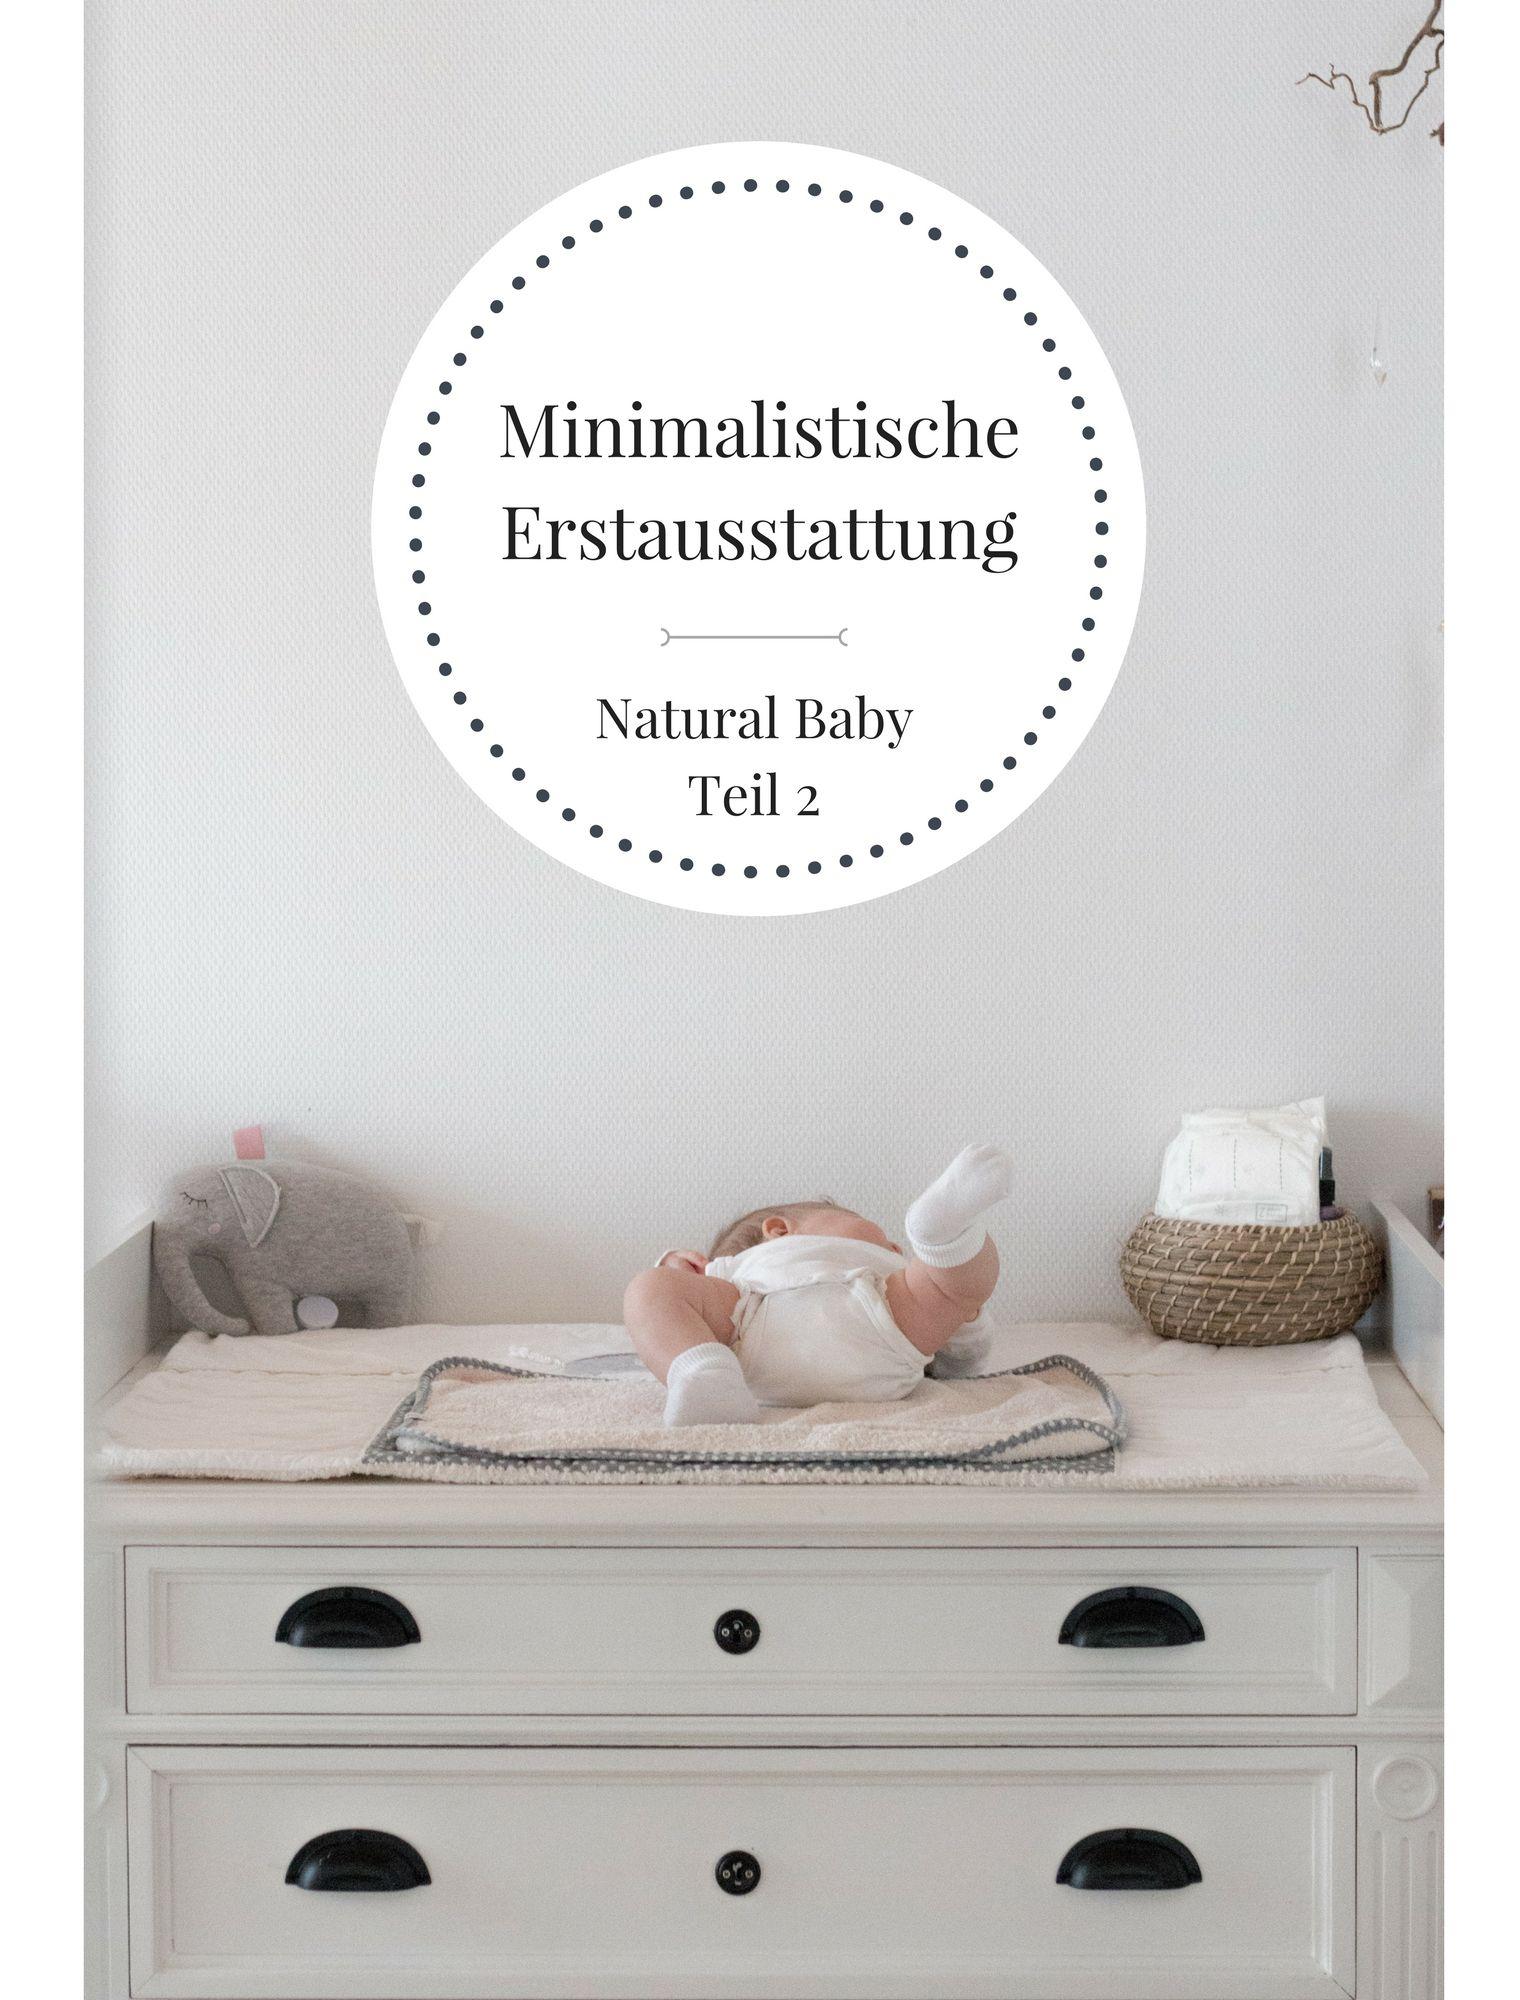 minimalistische erstausstattung natural baby flowers on my plate baby natural baby baby. Black Bedroom Furniture Sets. Home Design Ideas